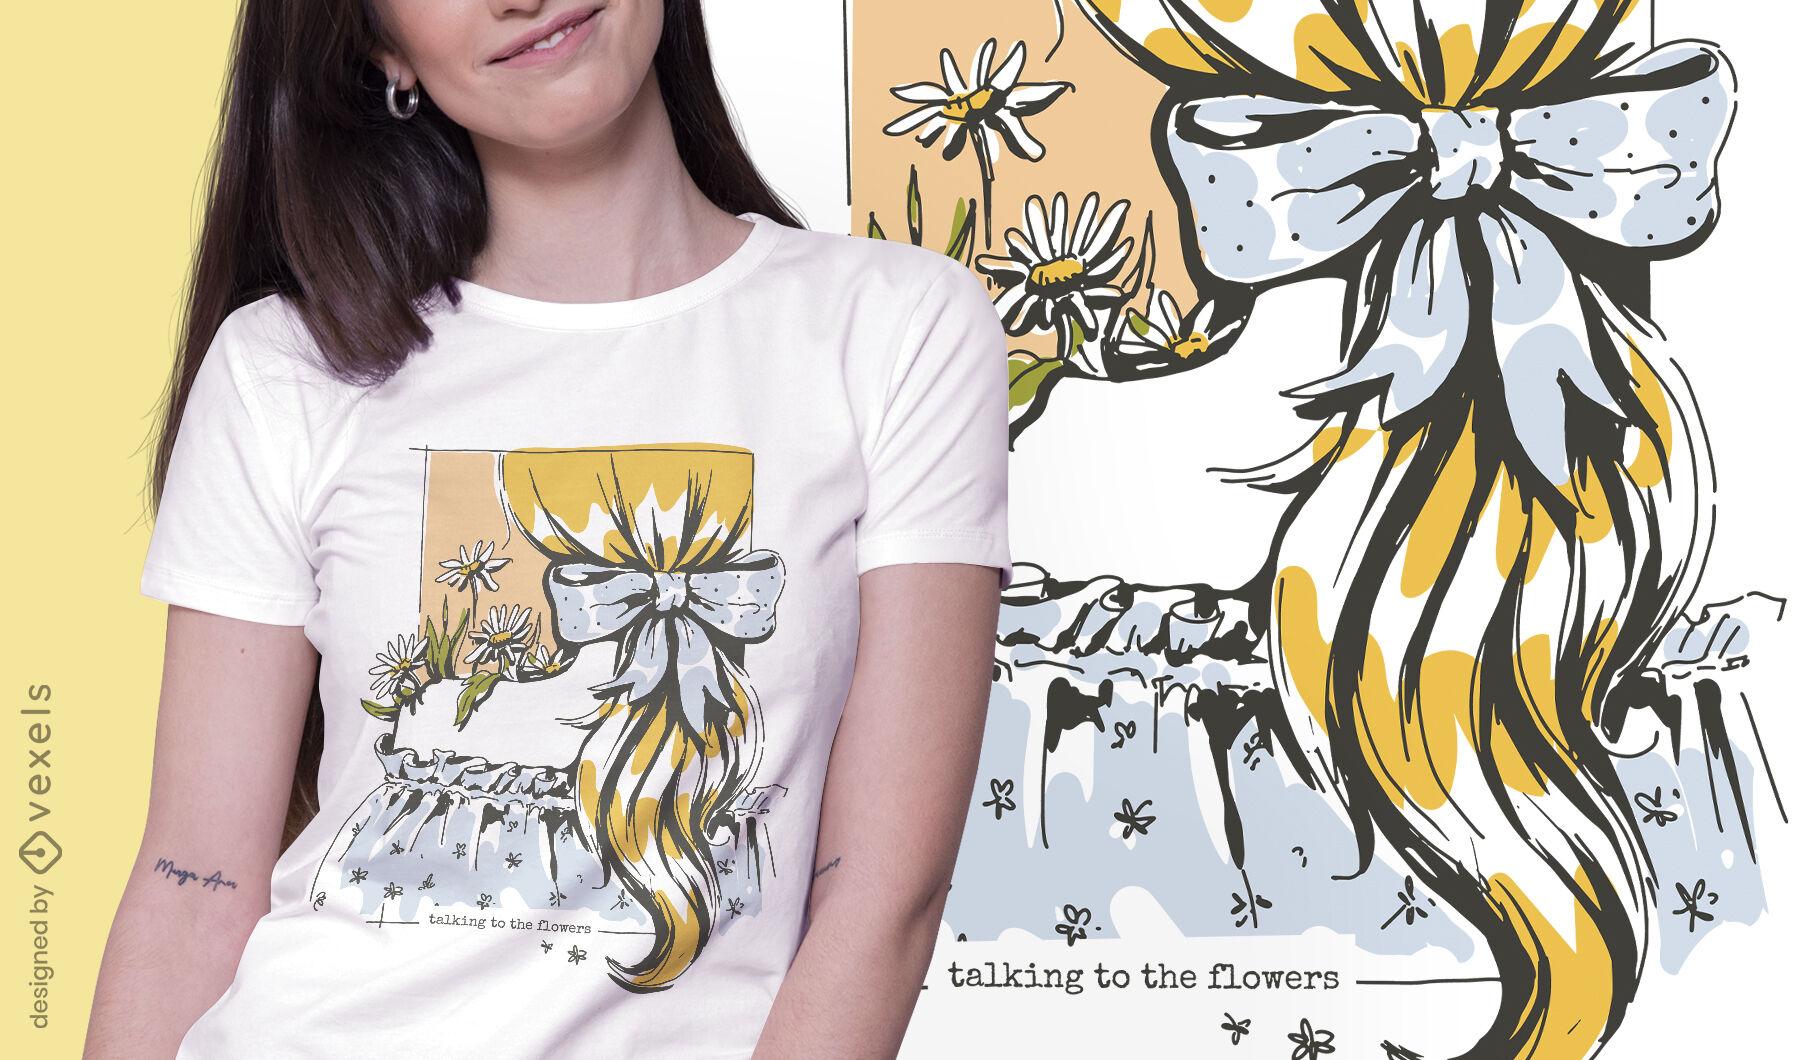 Diseño de camiseta de mujer Cottagecore lifestyle